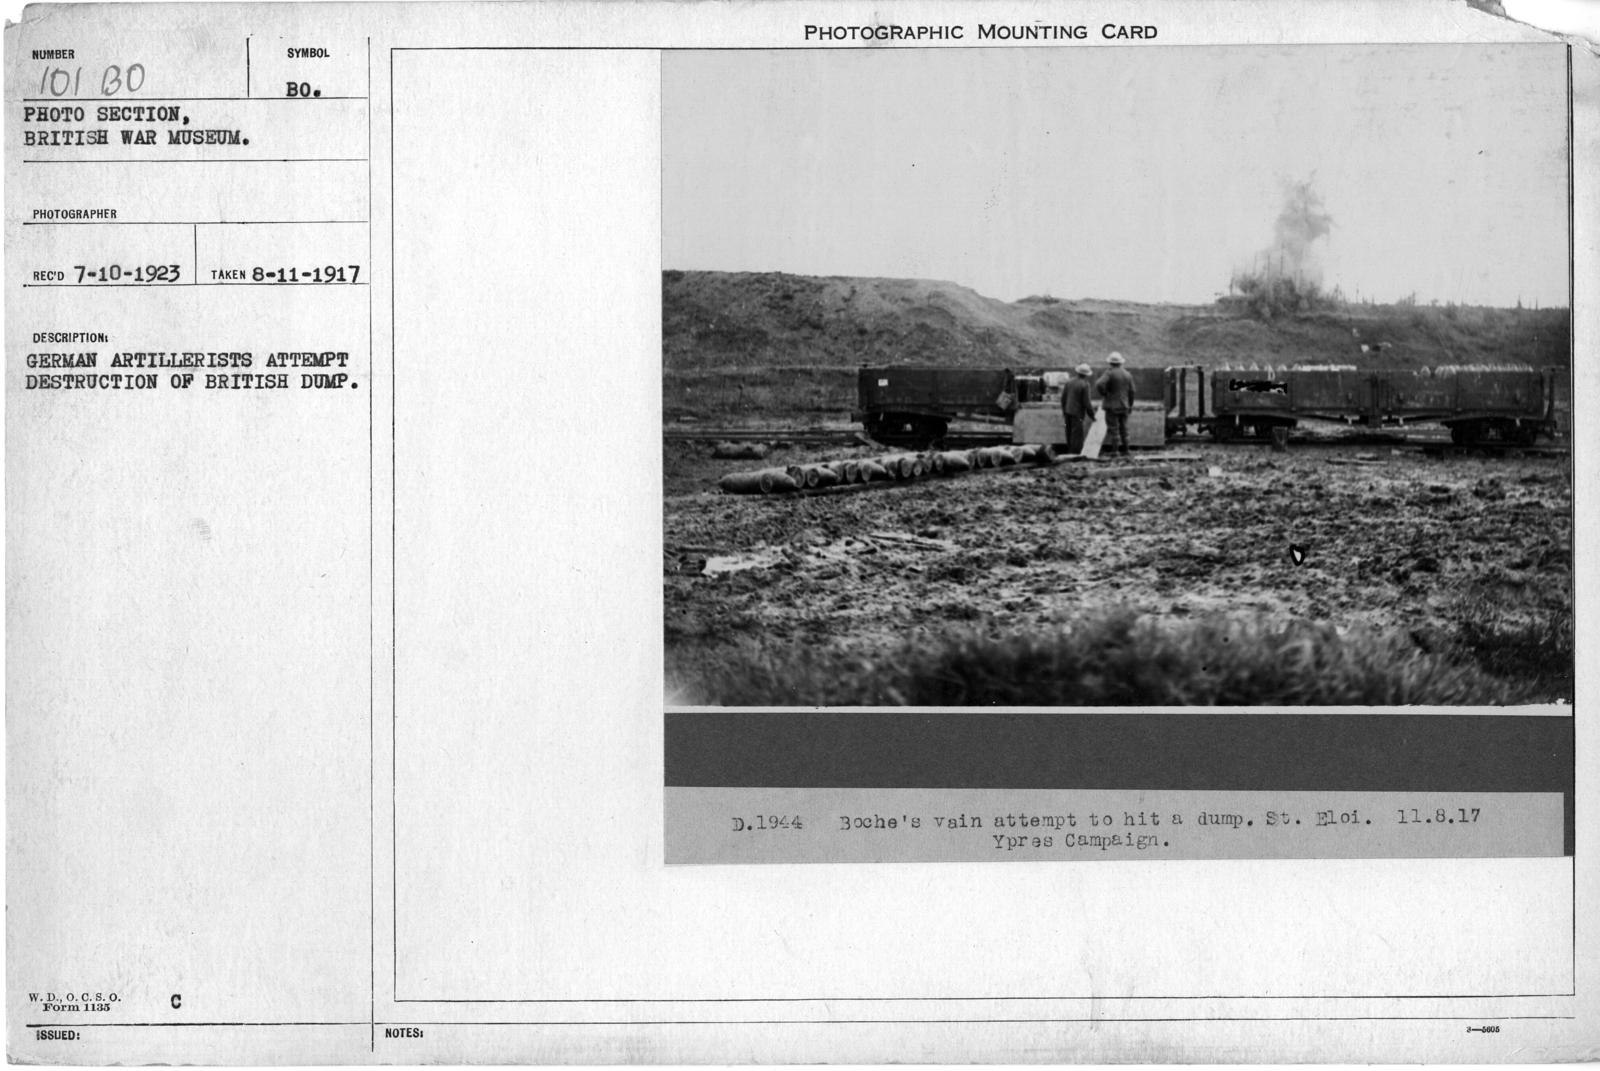 German Artillerist attempt destruction of British dump